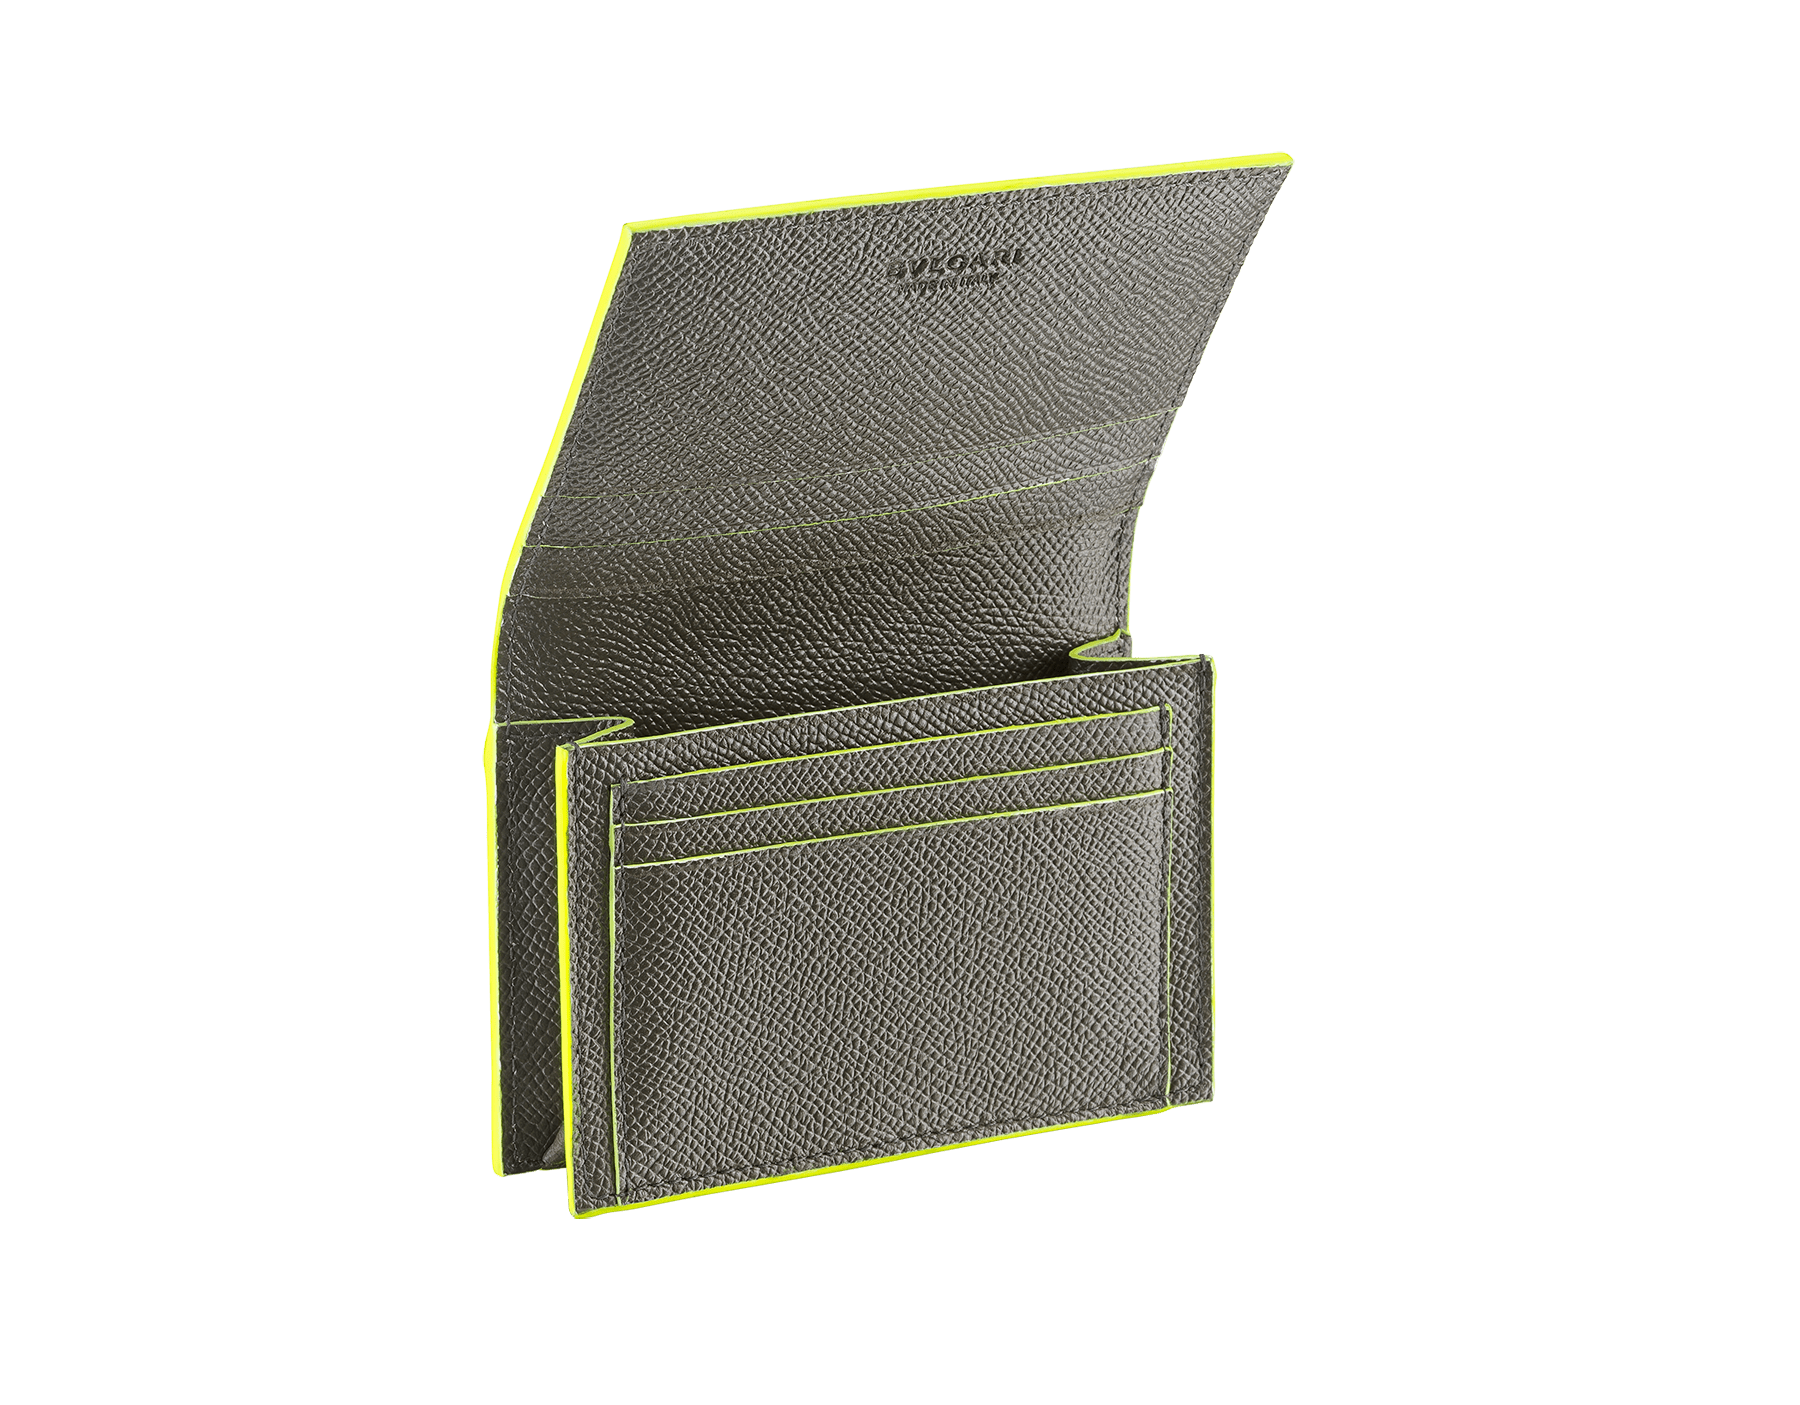 BVLGARI x FRAGMENT by Hiroshi Fujiwara ビジネスカードホルダー。 ホークアイと蛍光イエローのグレインカーフレザー製。特別なBVLGARI FRGMTのブラックロゴプリント。 289568 image 2